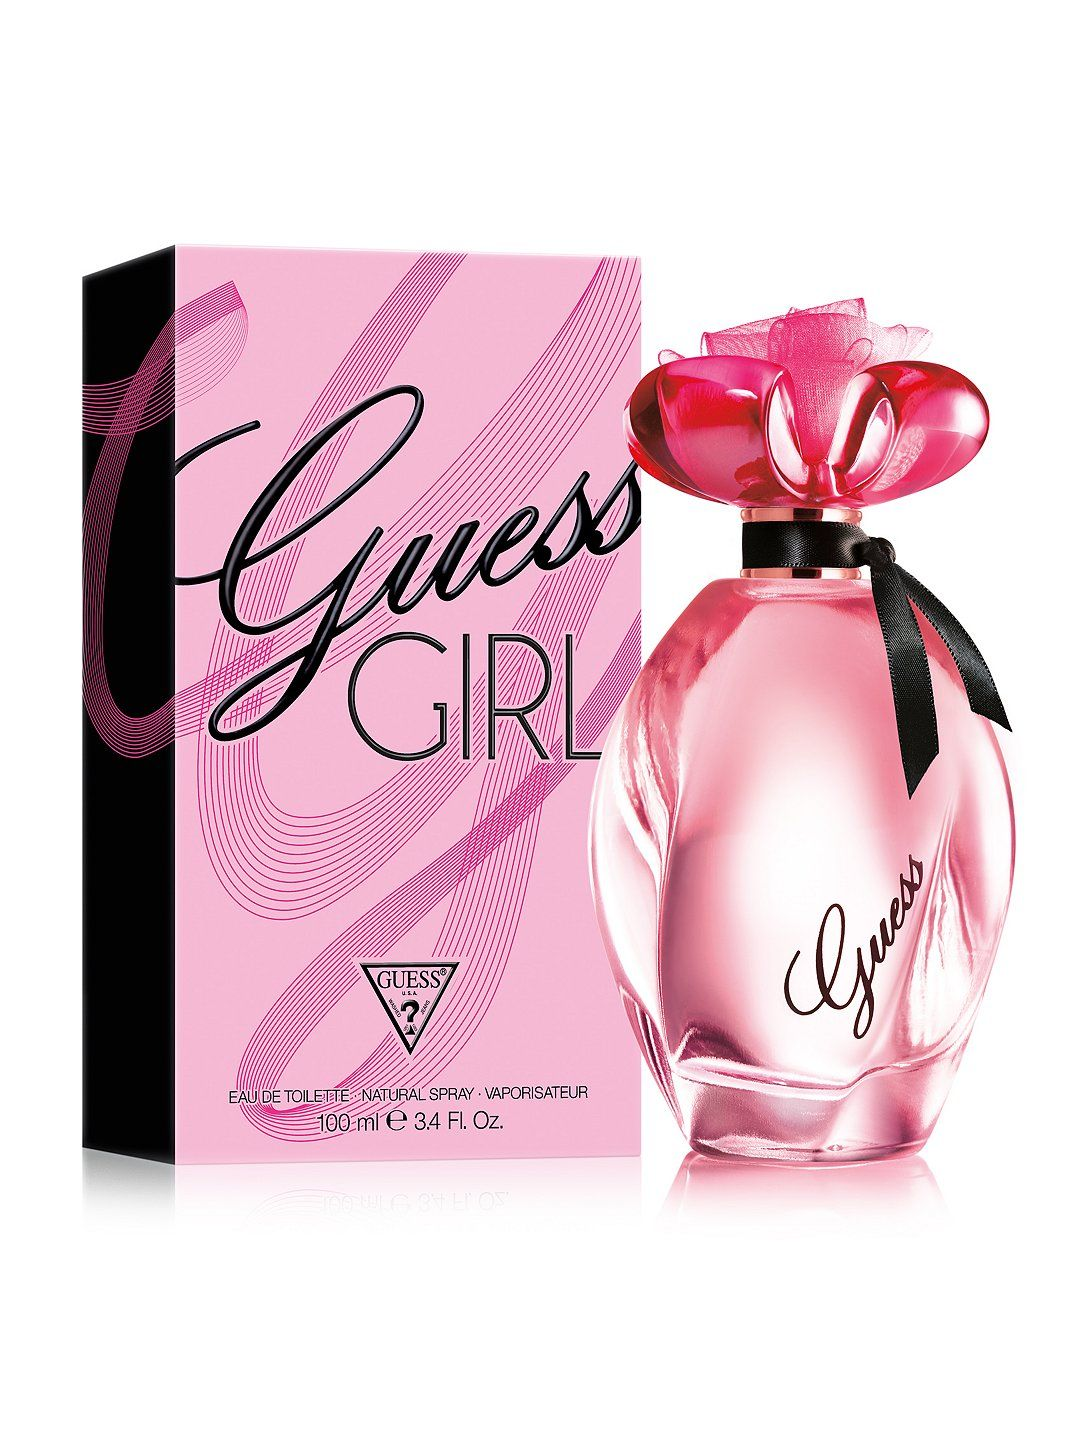 GUESS Girl Eau De Toilette, 3.4 Oz at Guess | Women perfume